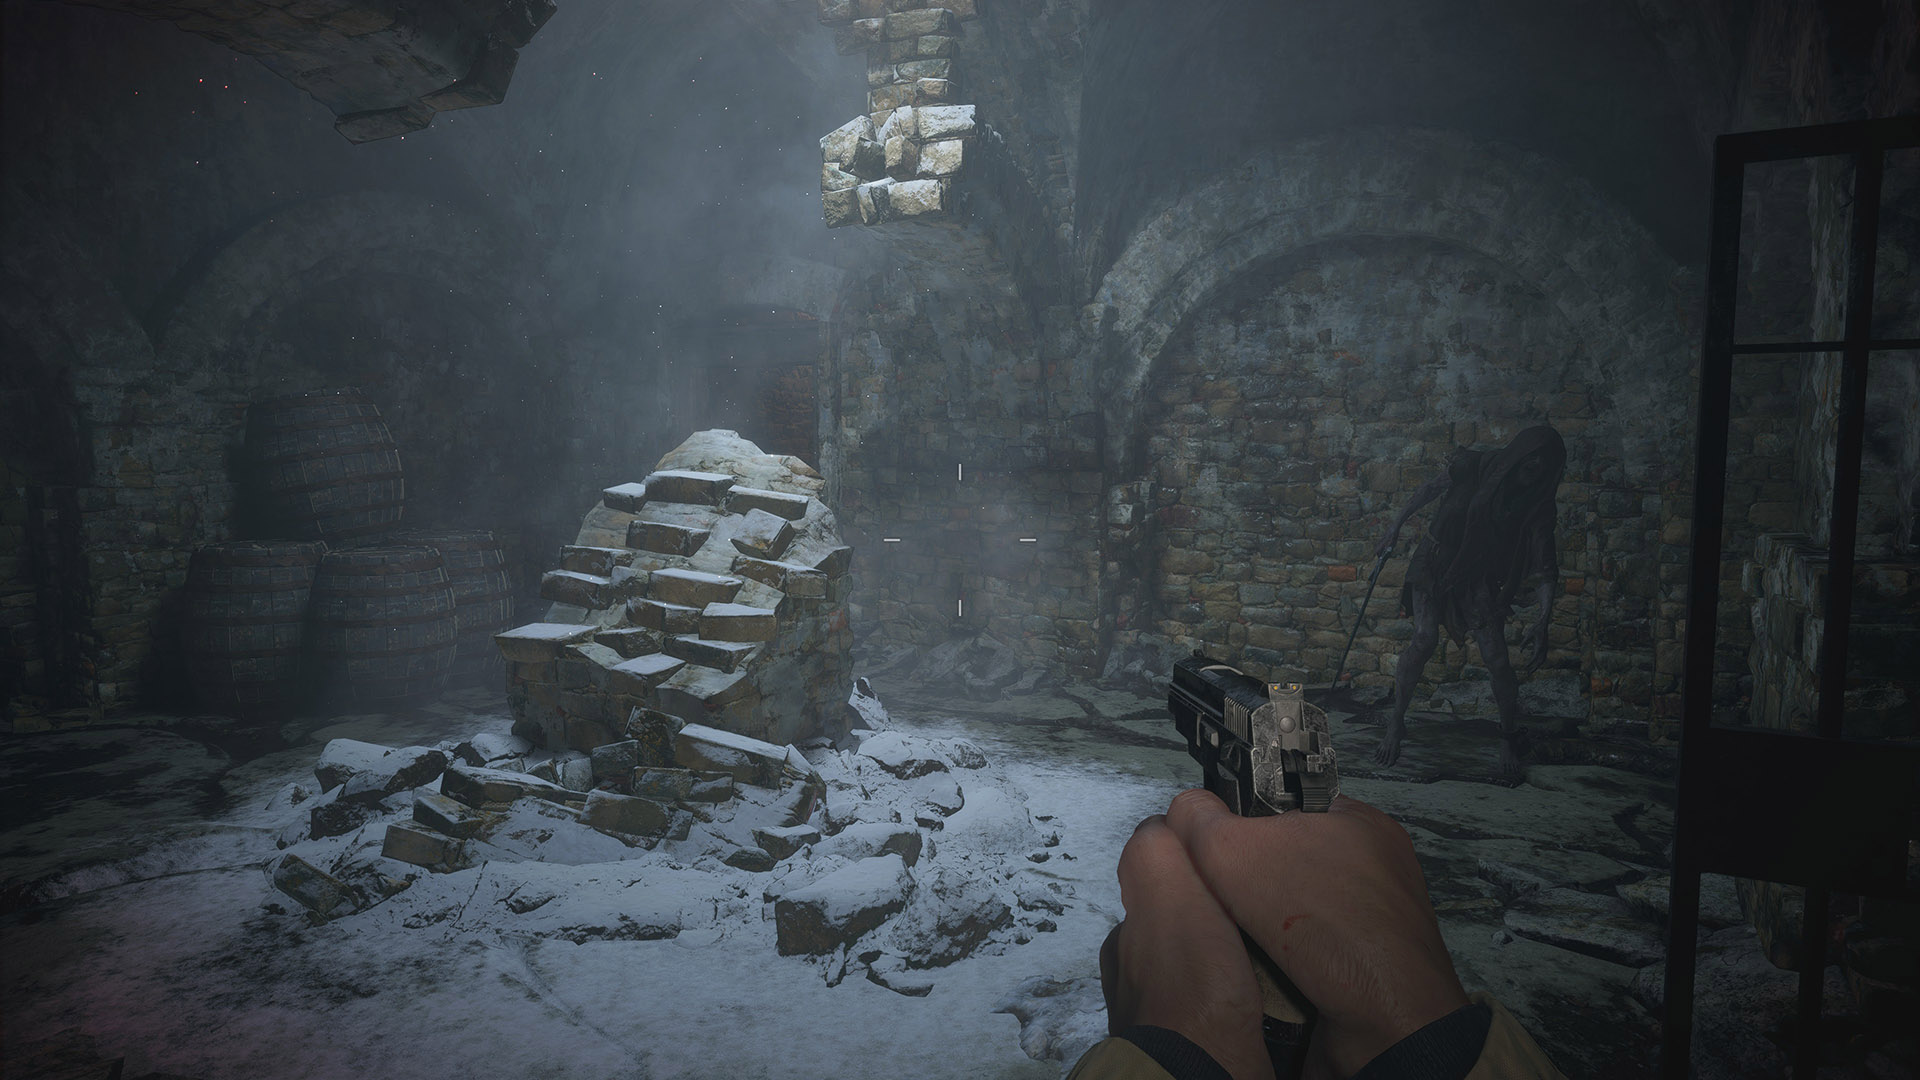 PC《生化危机8》试玩版高配光追4K画质截图公布 角色模型细致